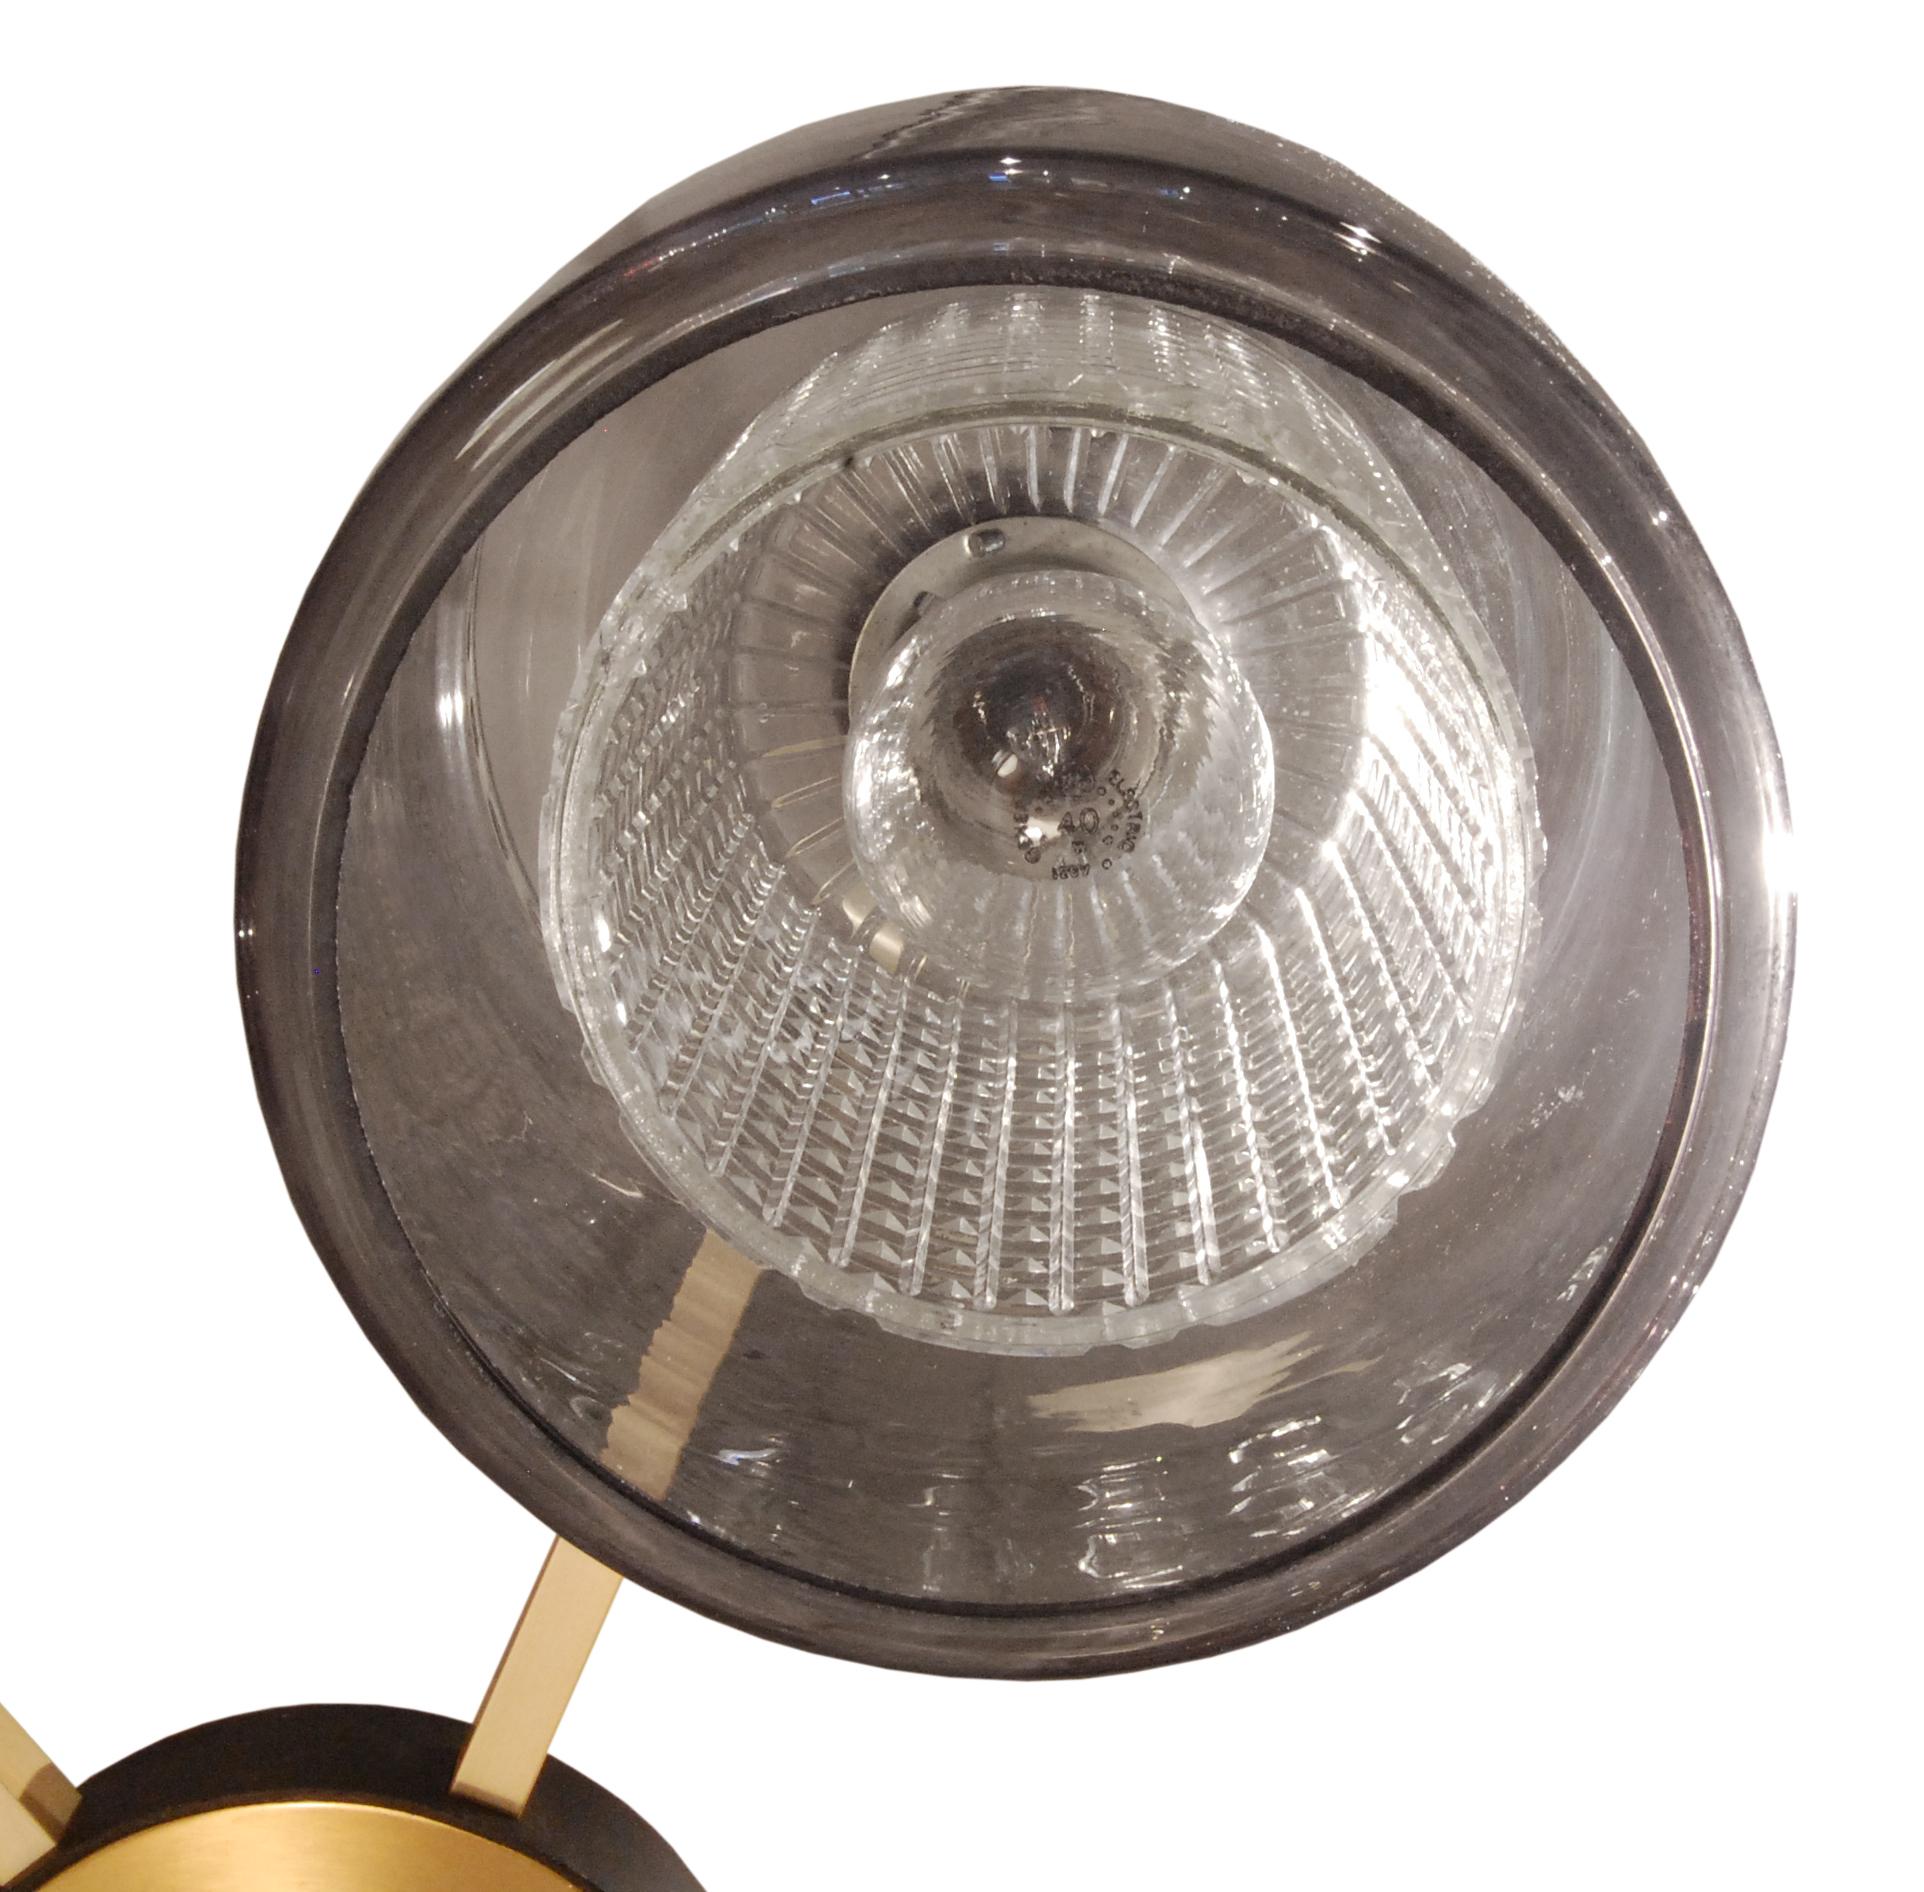 50's 45 Lrg rnd 6 glass shadesbrass chandelier157 bulb detail hires.jpg